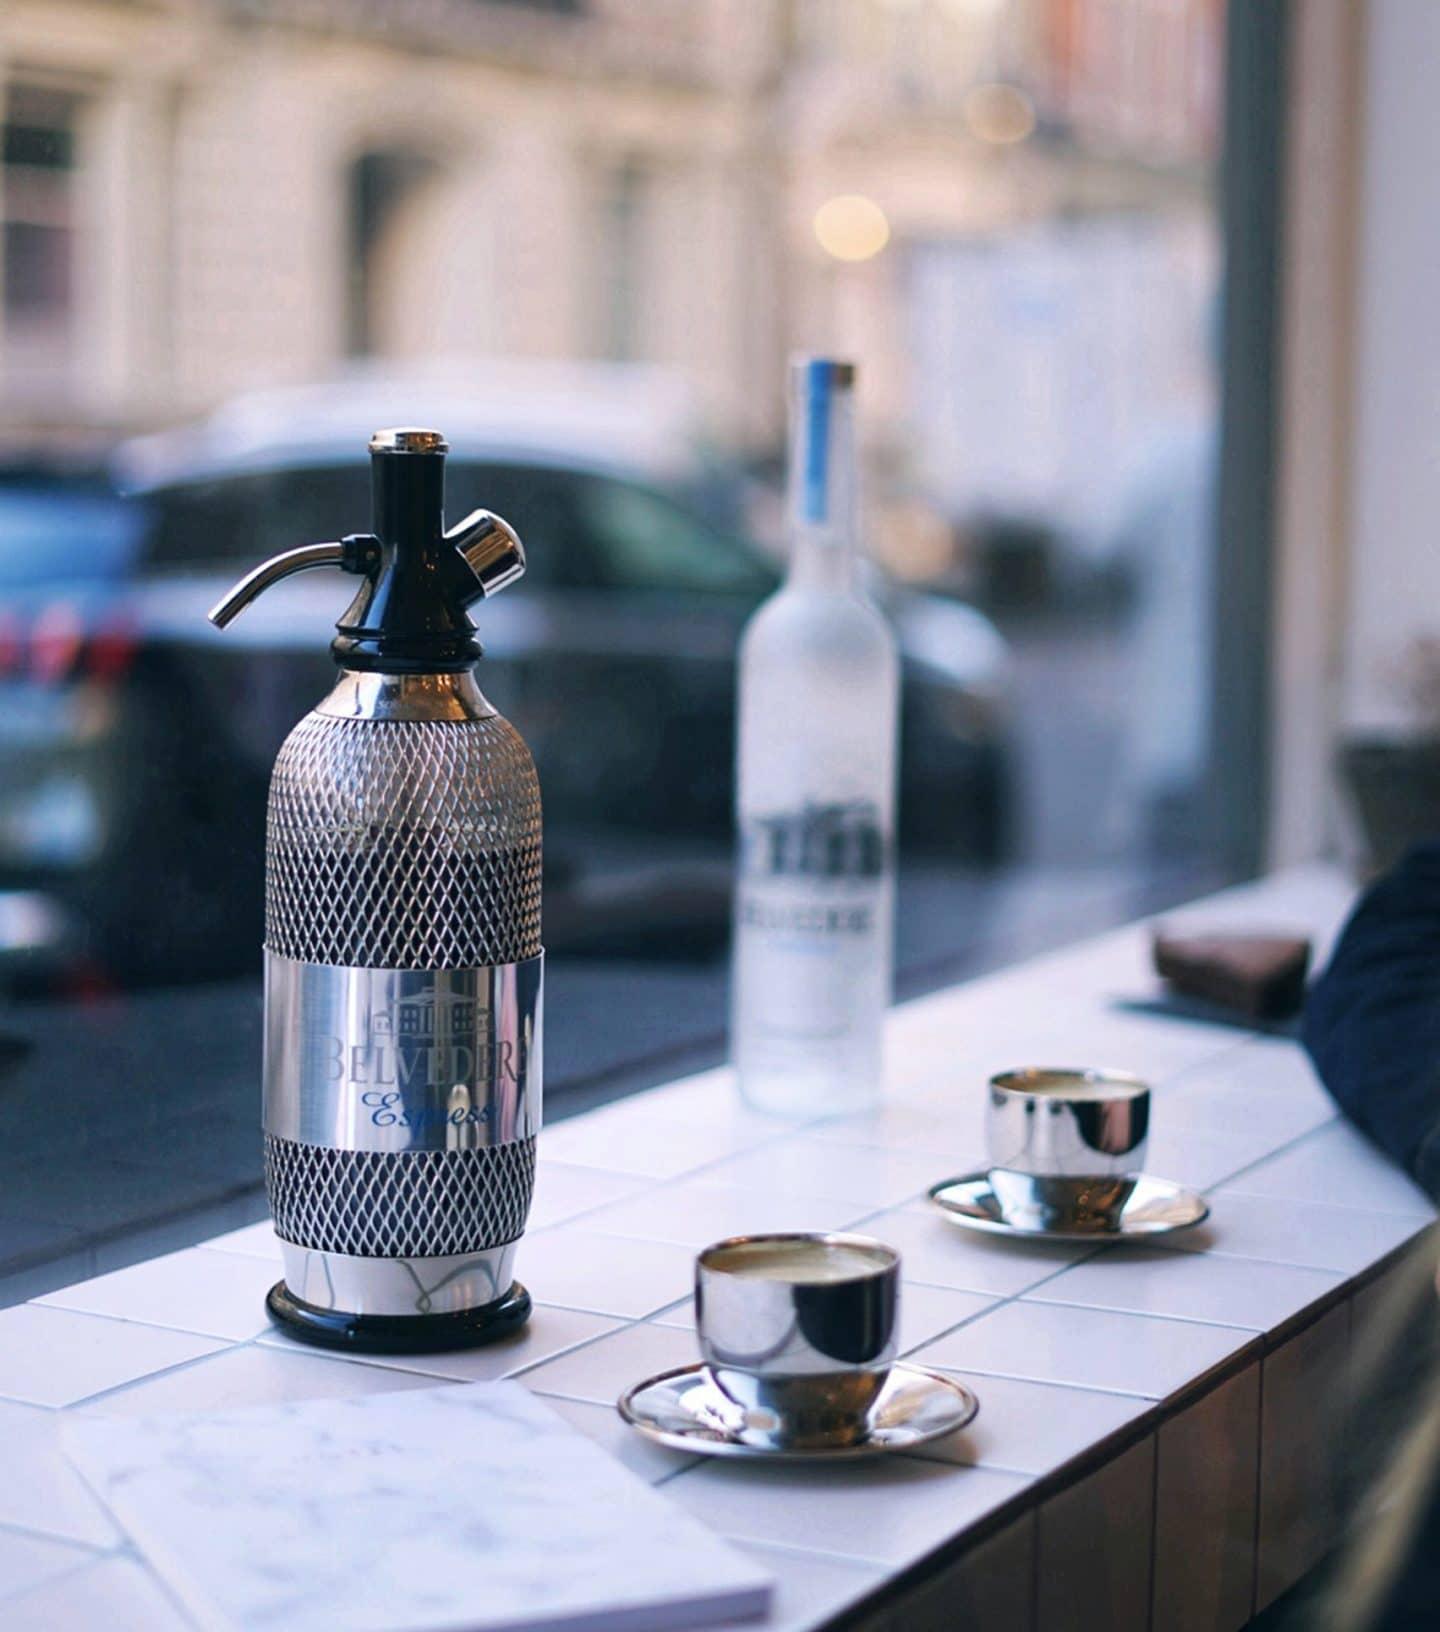 Cafe Belvedere Espresso Martini